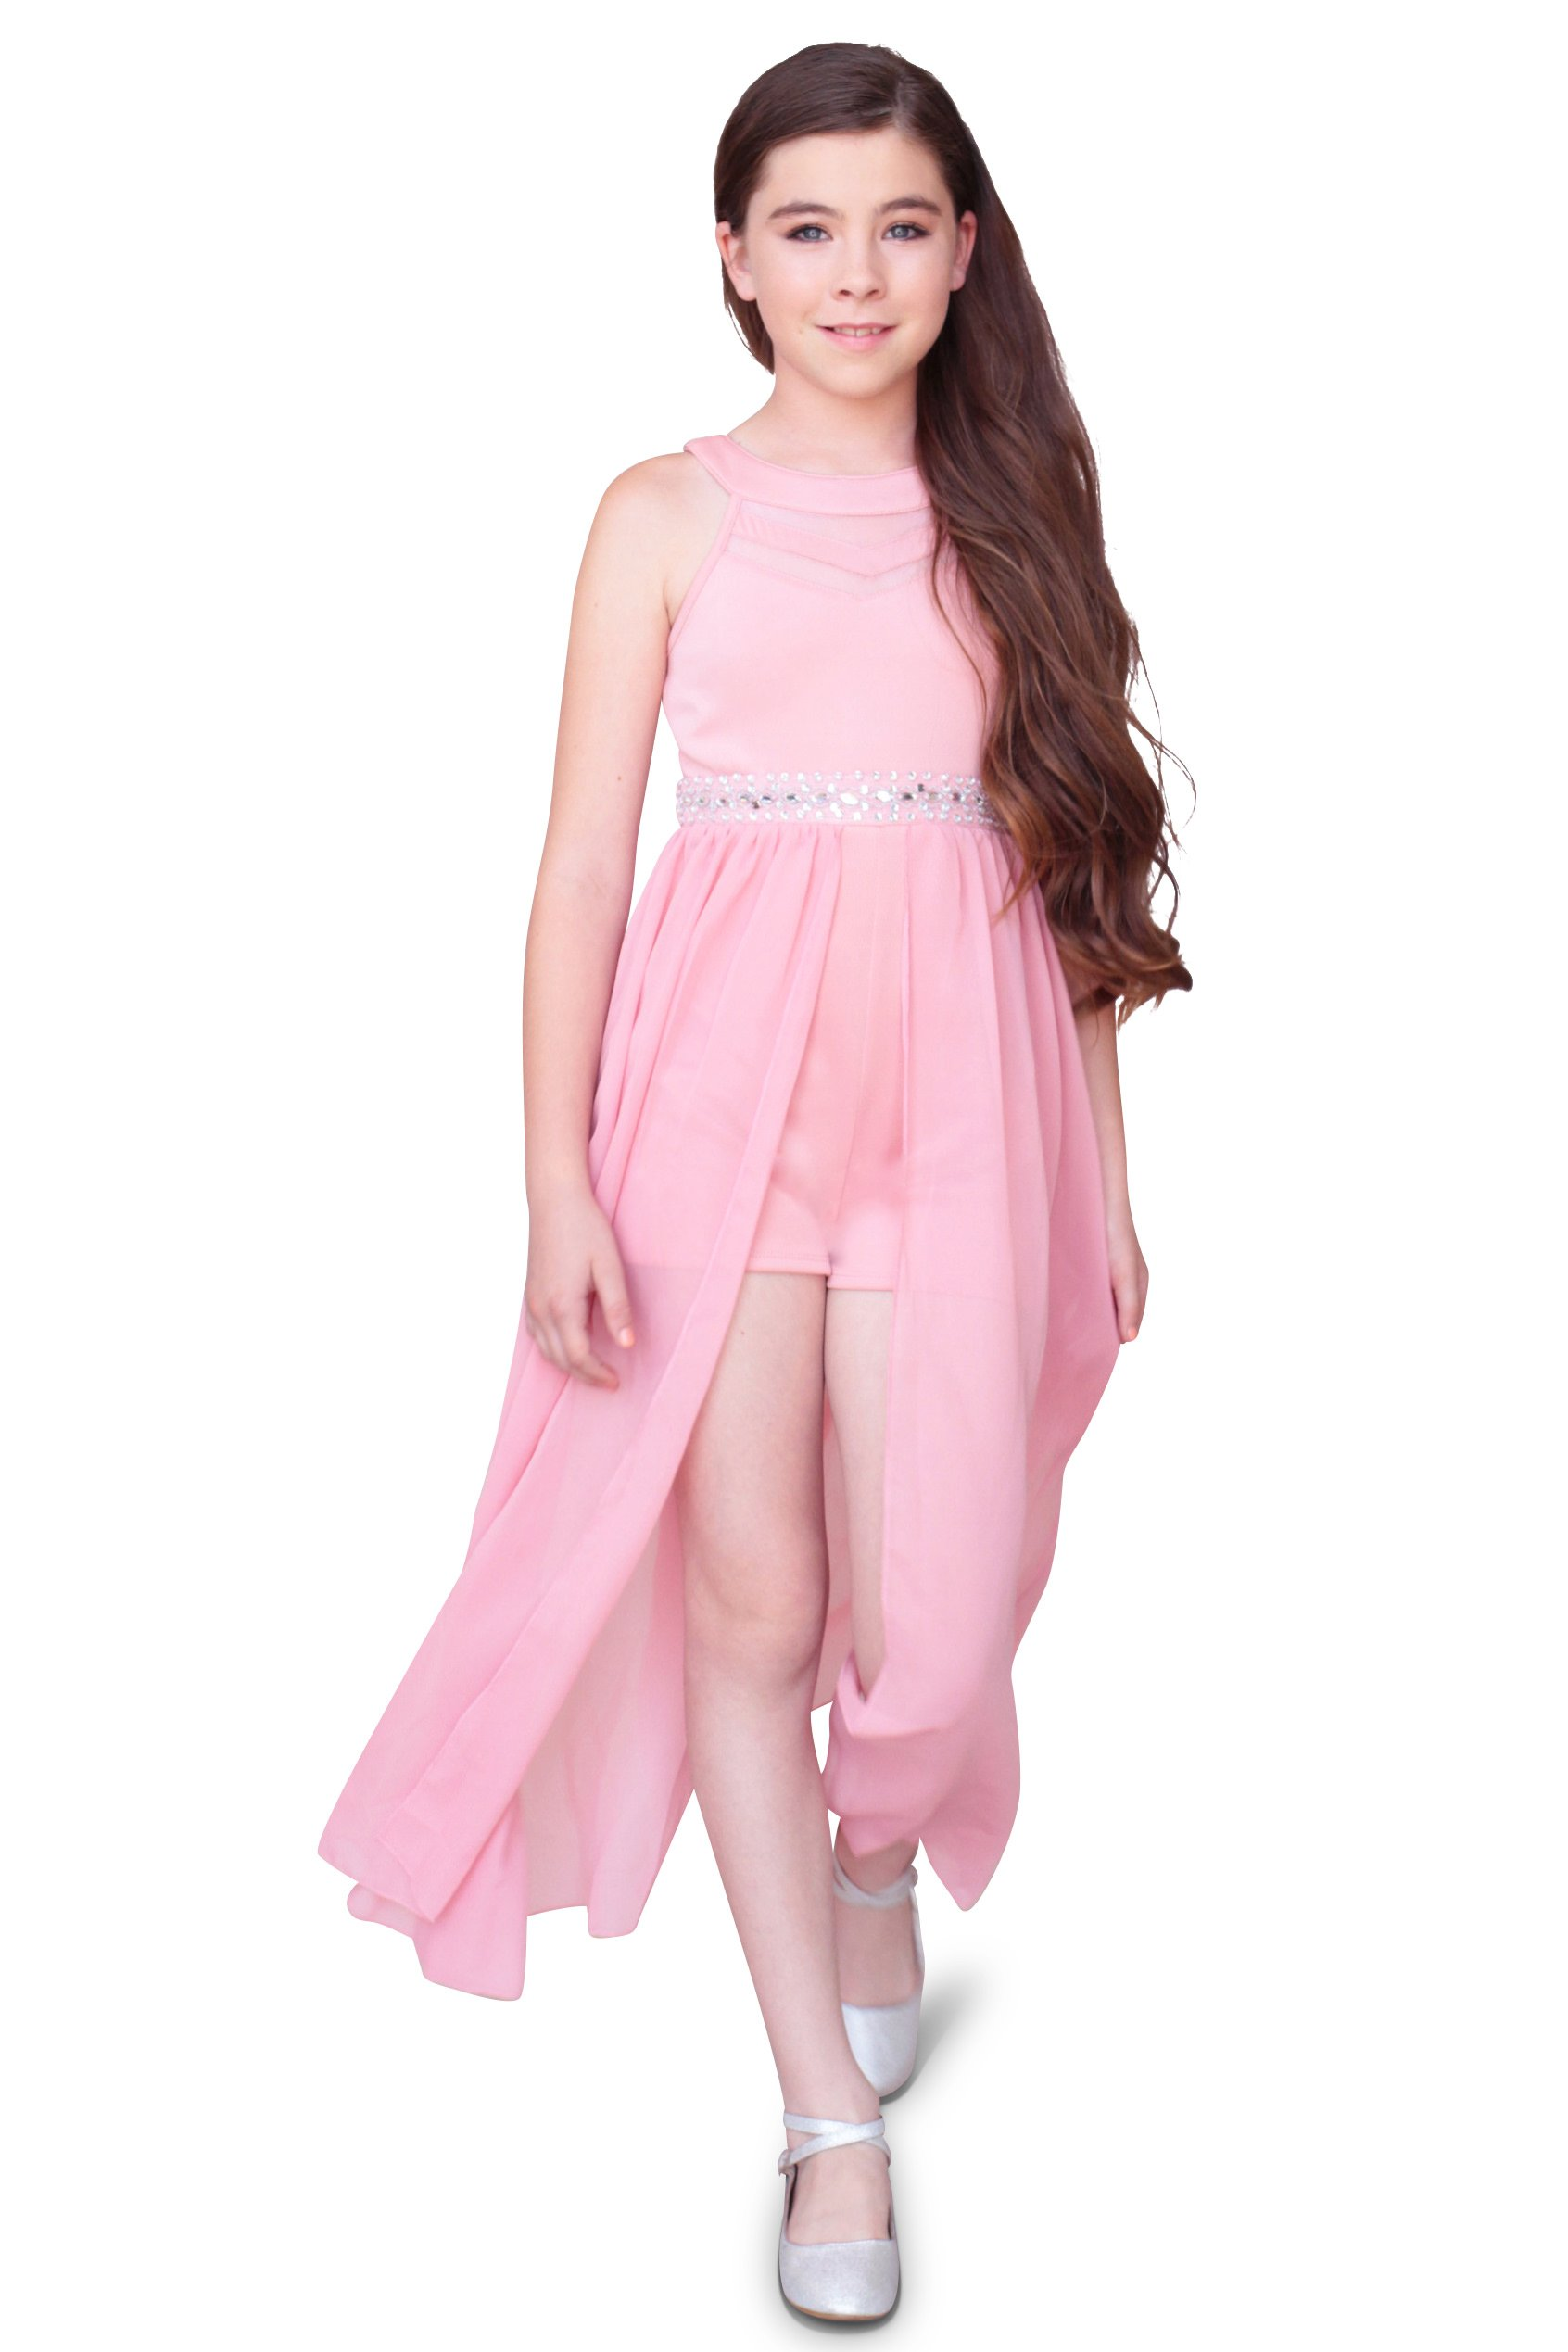 Emerald Sundae Girls Illusion Halter Maxi Romper Dress, Pink, Size 16